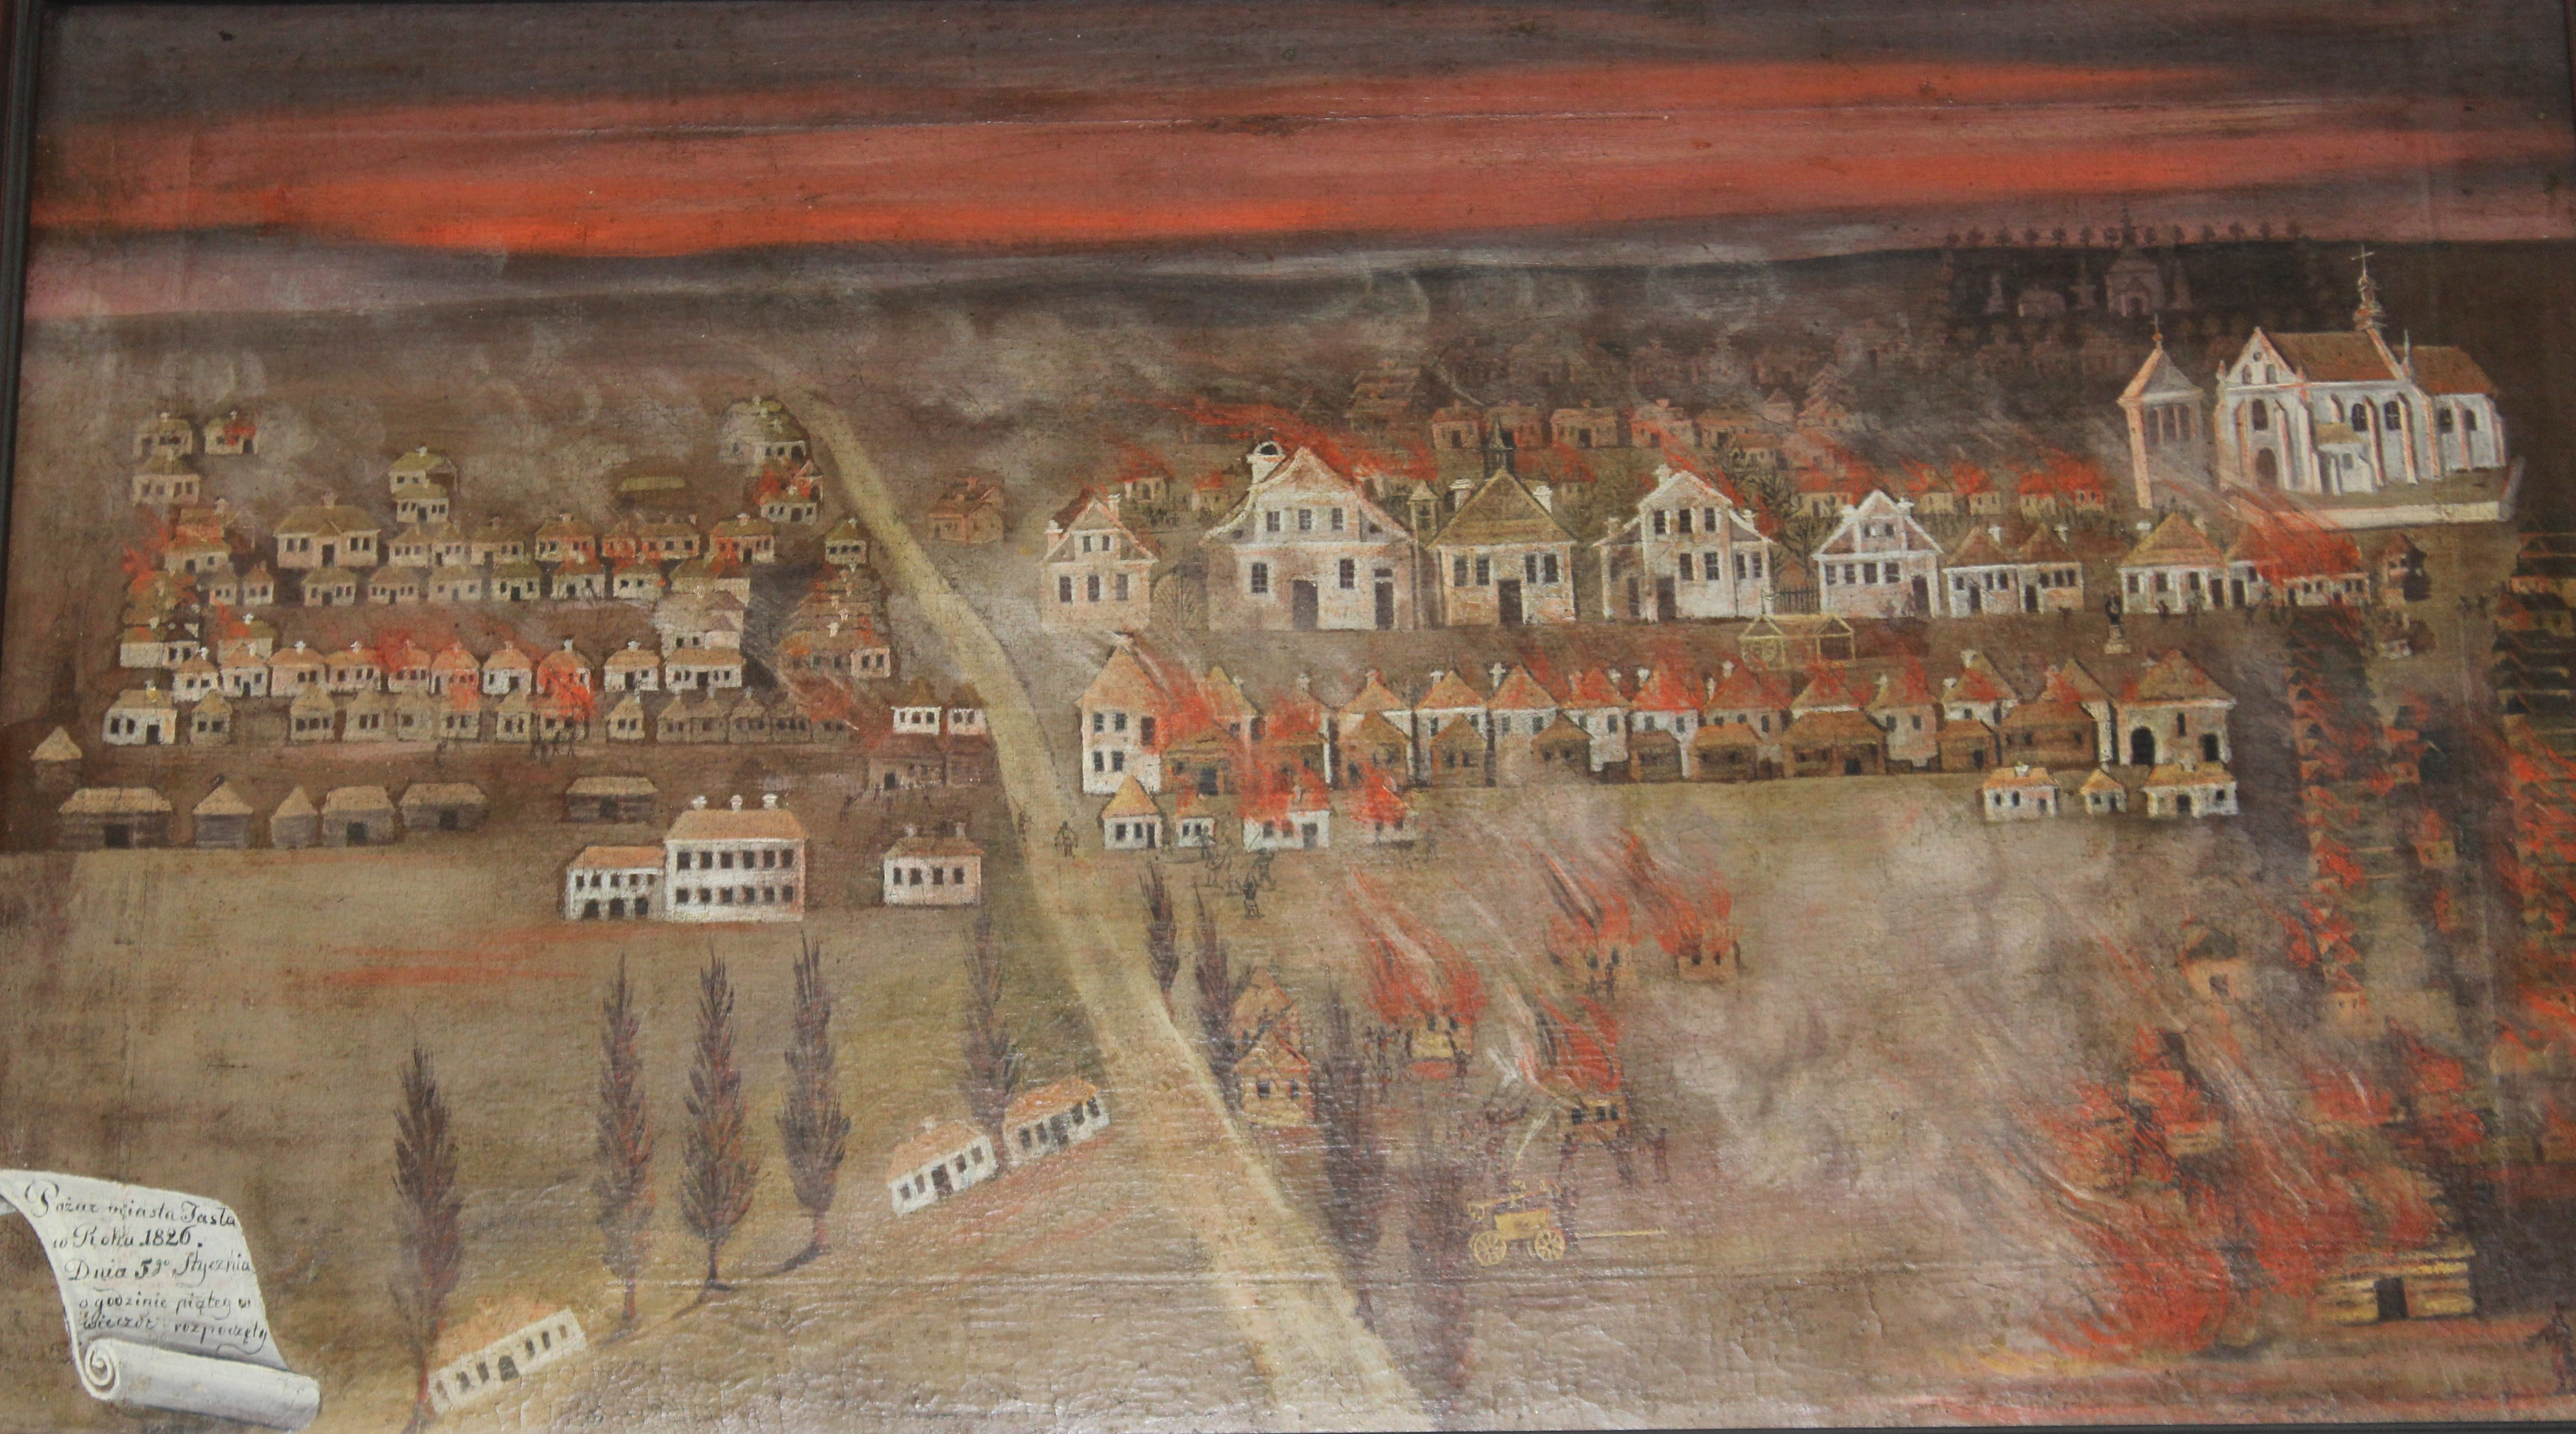 01 - Jan Seweryn, Pożar Jasła w 1826 r